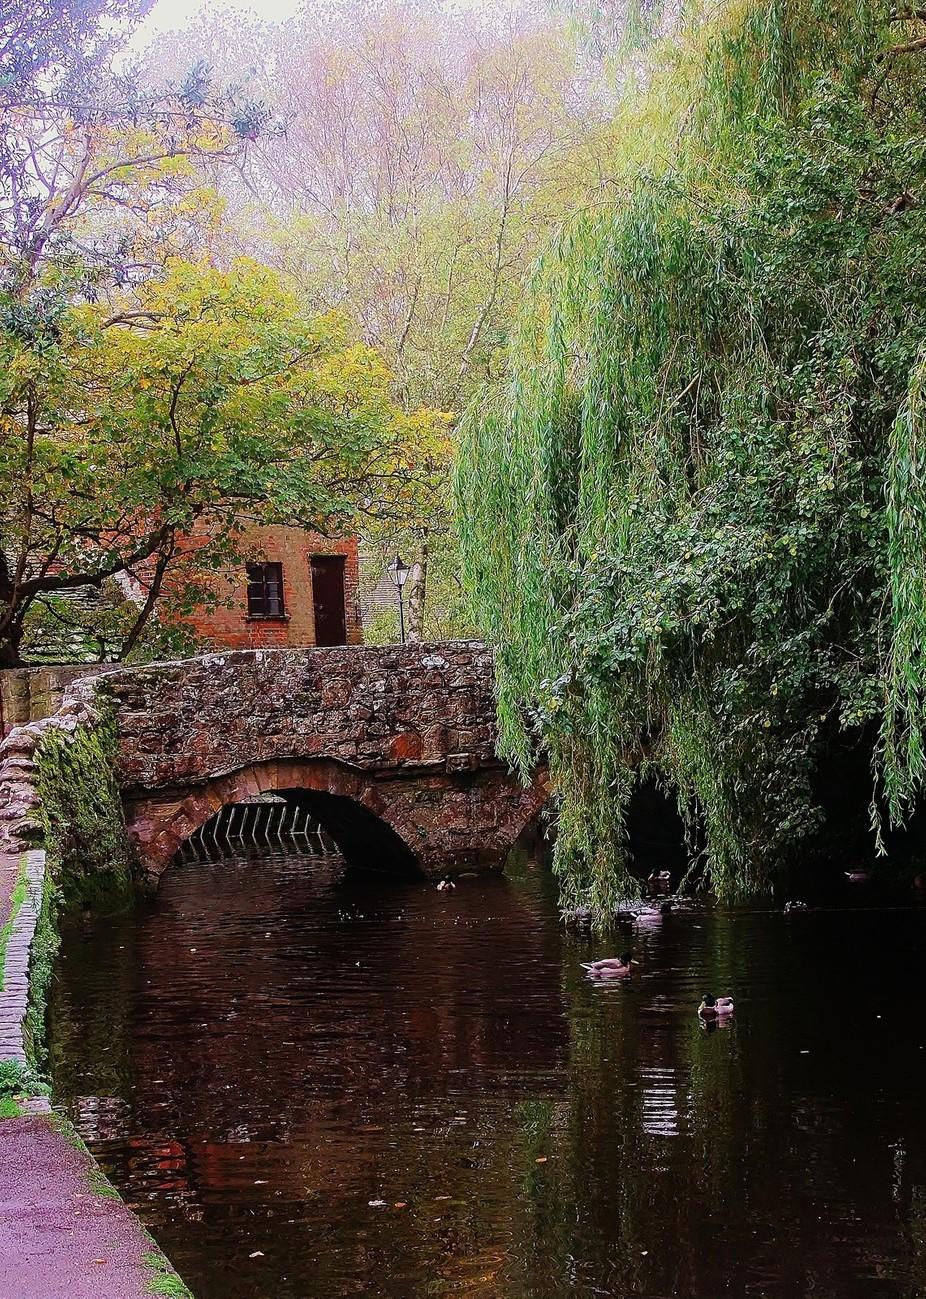 BRIDGE AND WATERMILL